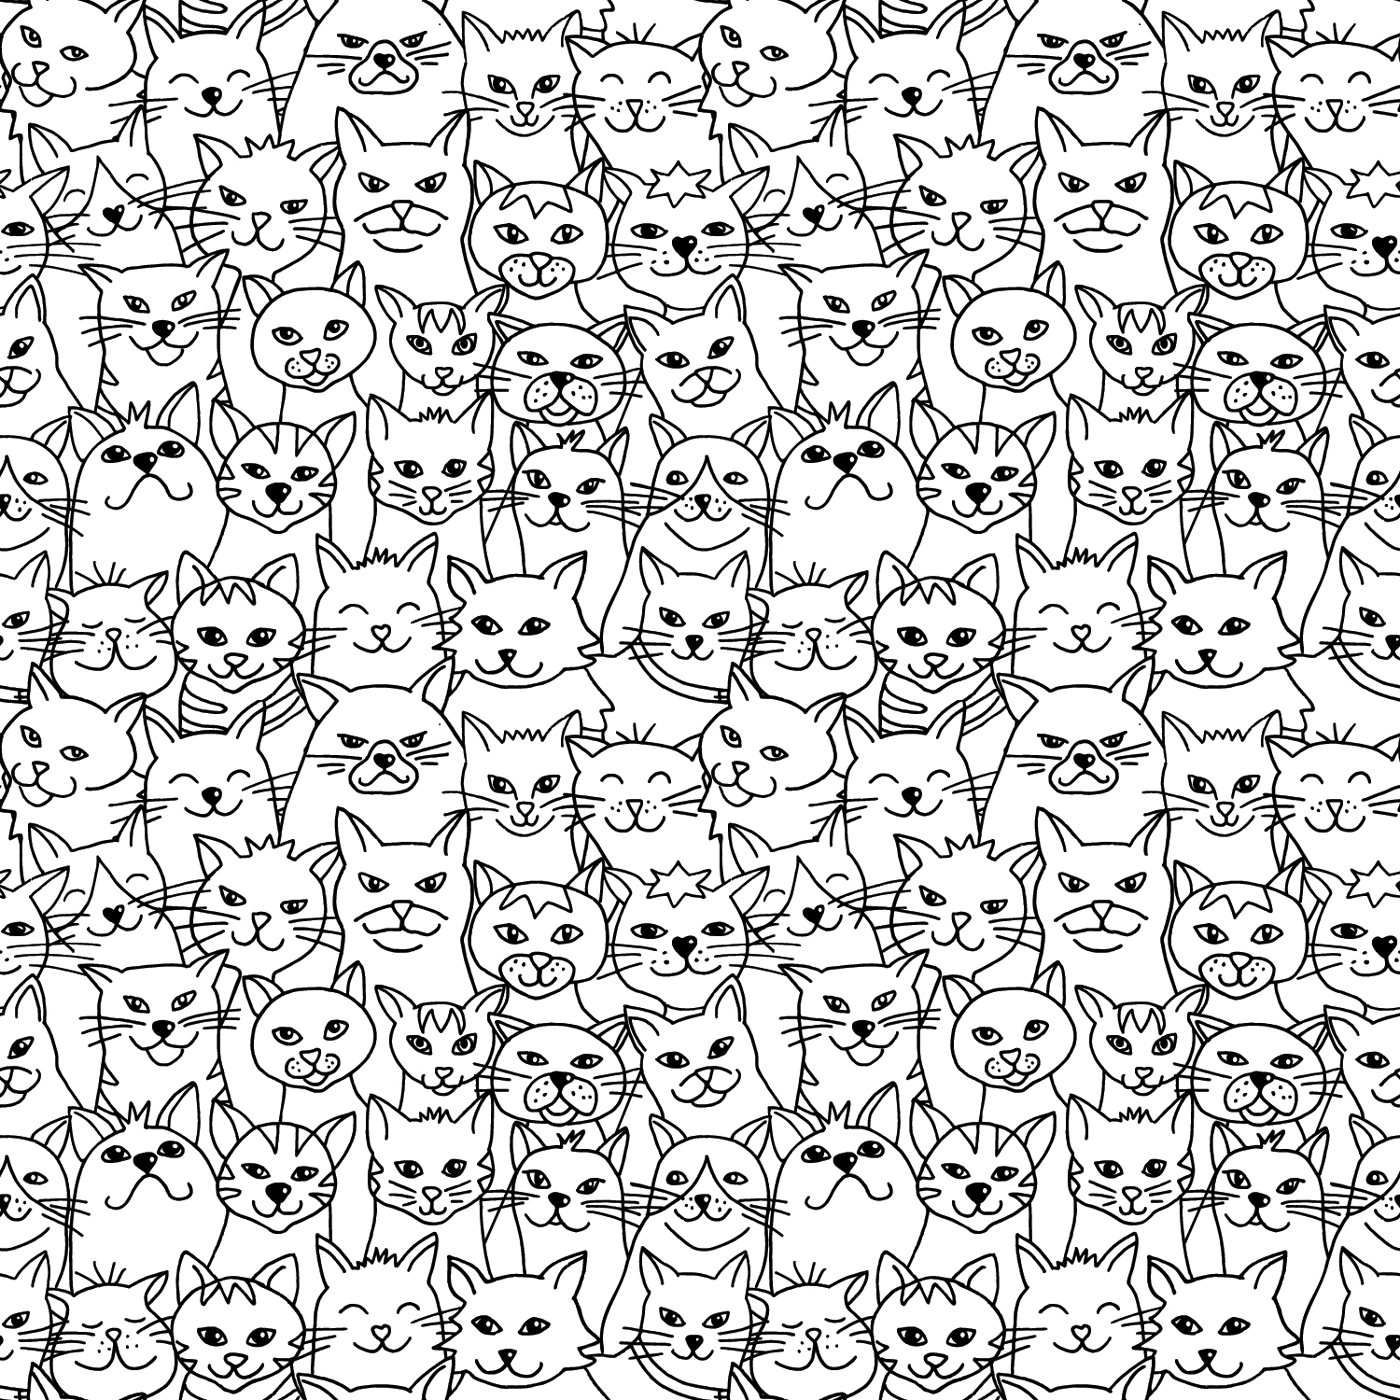 Detours-Cats.jpg